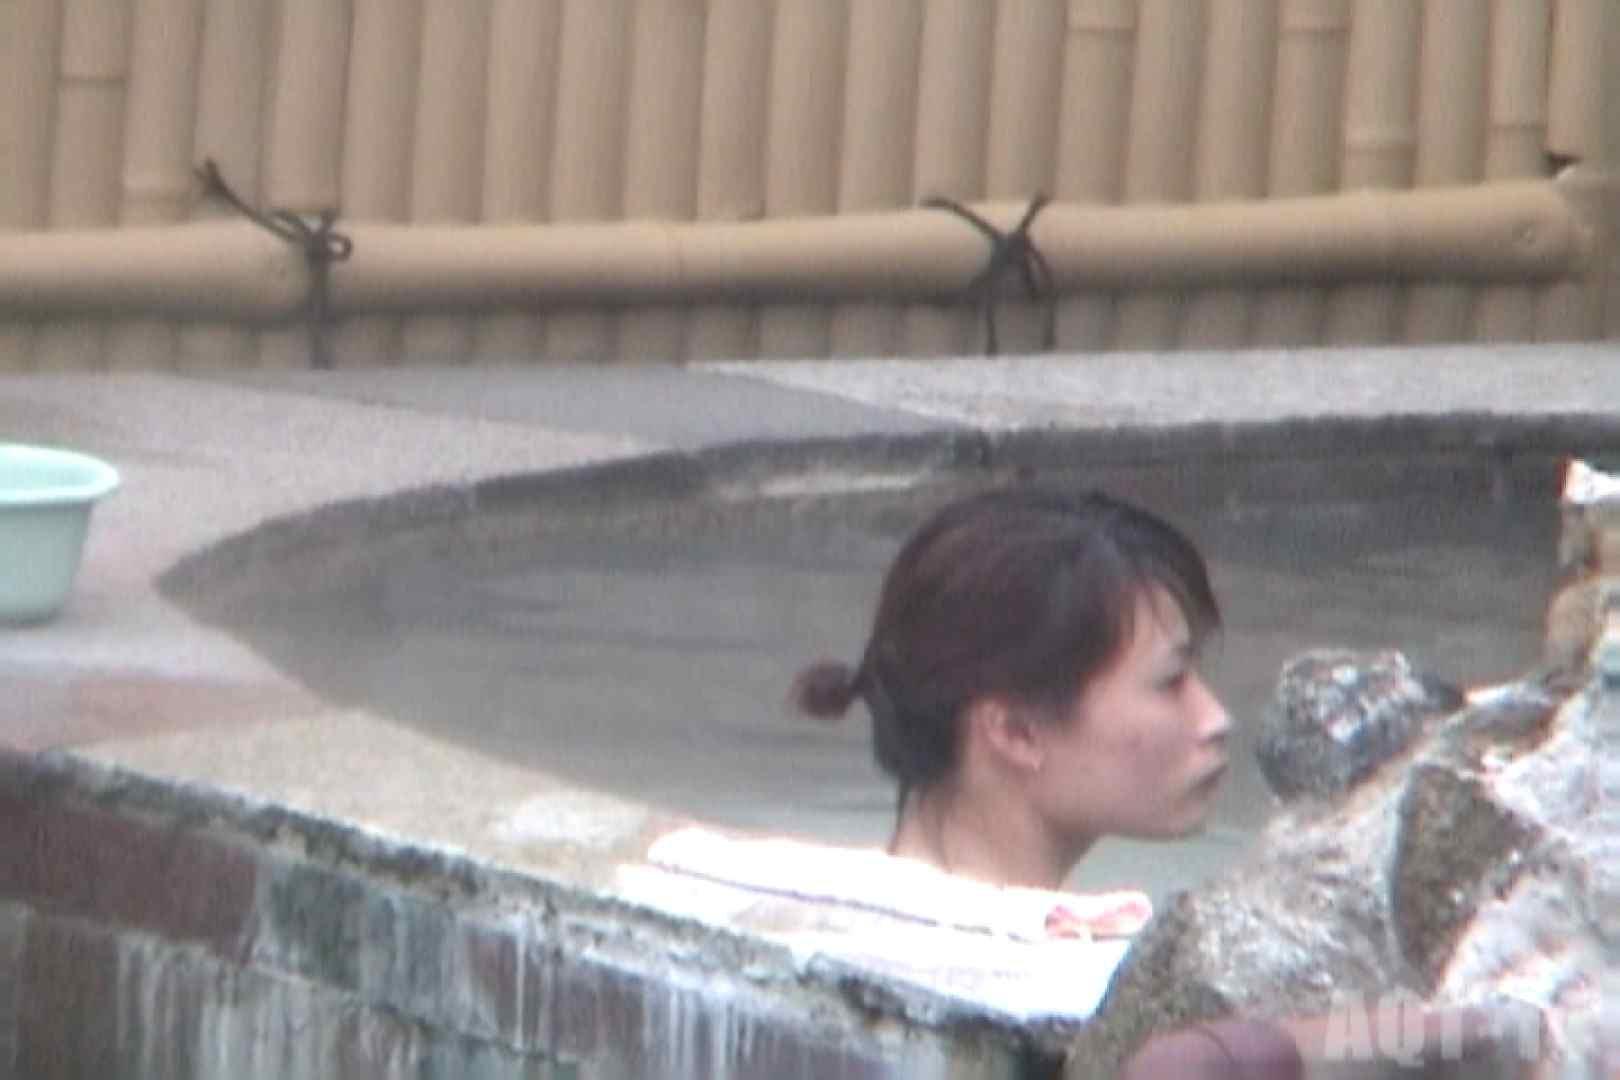 Aquaな露天風呂Vol.822 盗撮師作品 SEX無修正画像 75pic 35